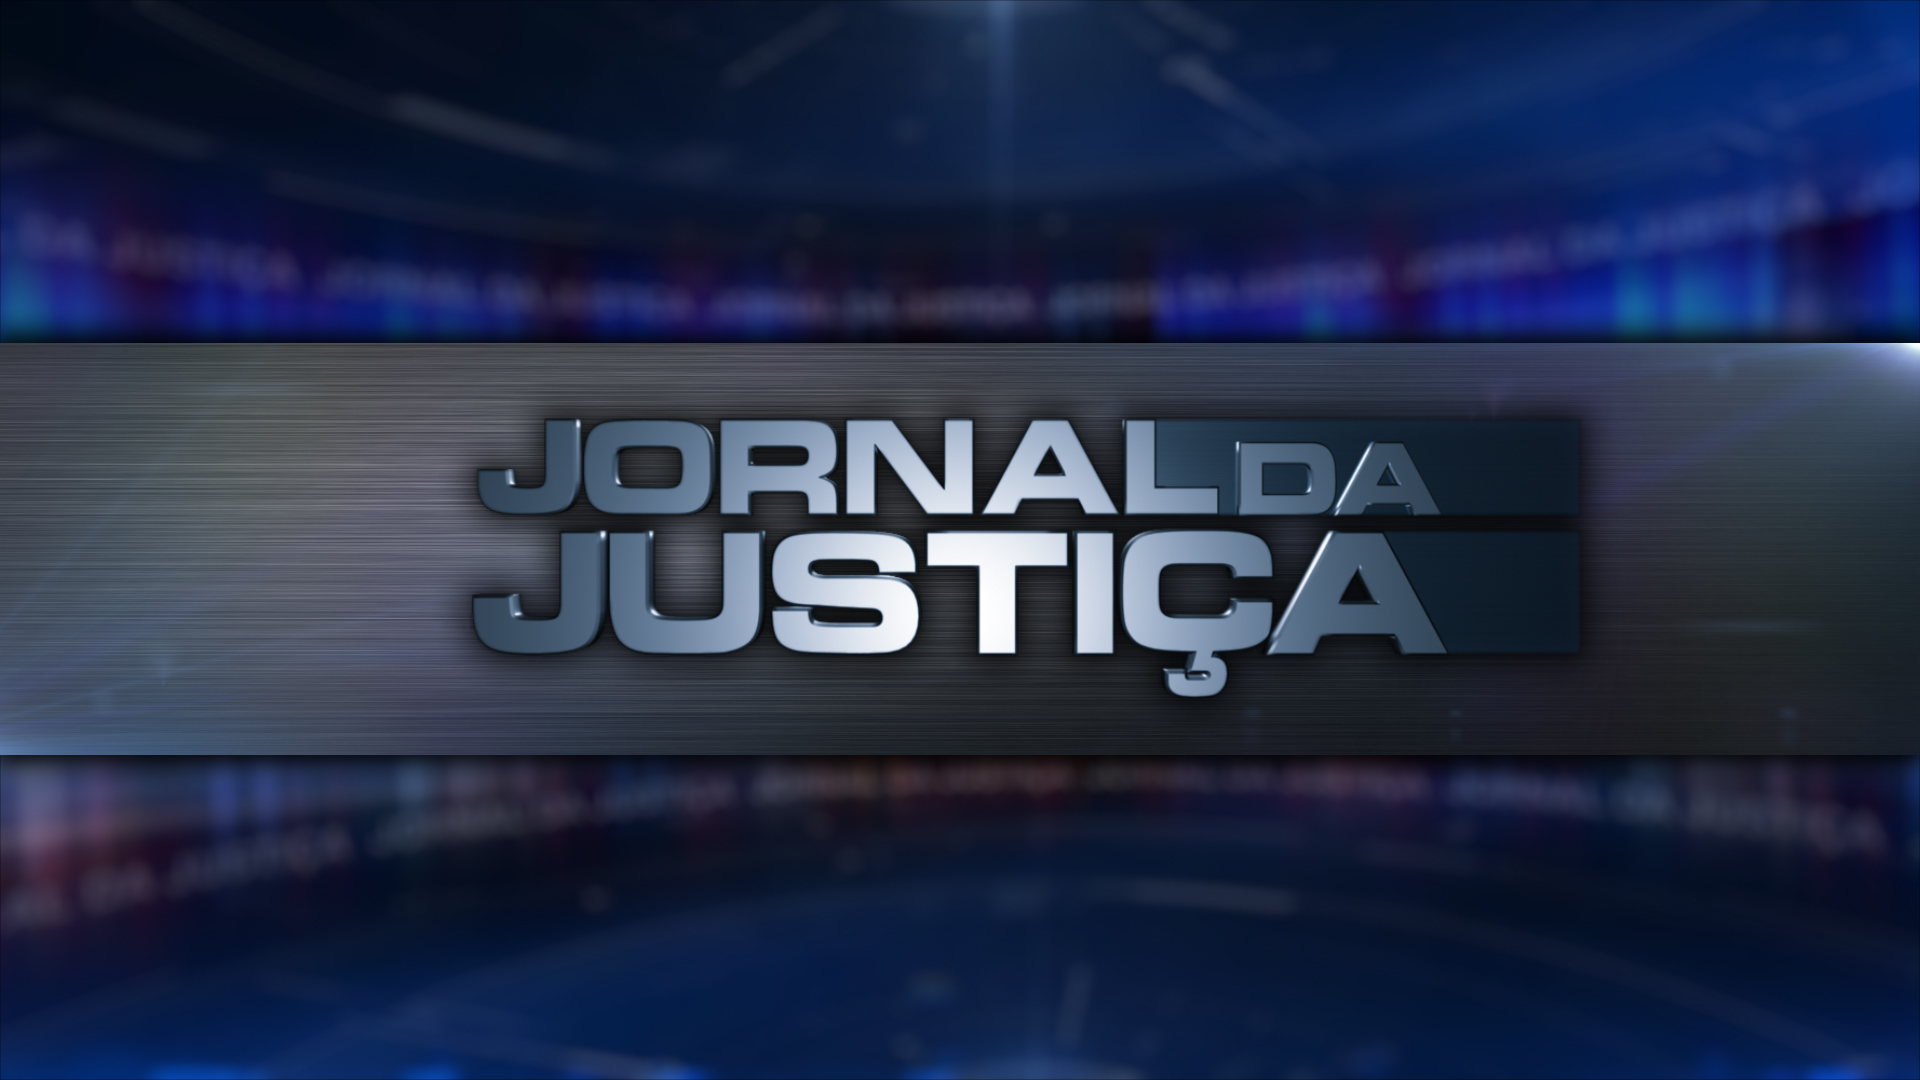 Jornal da Justiça